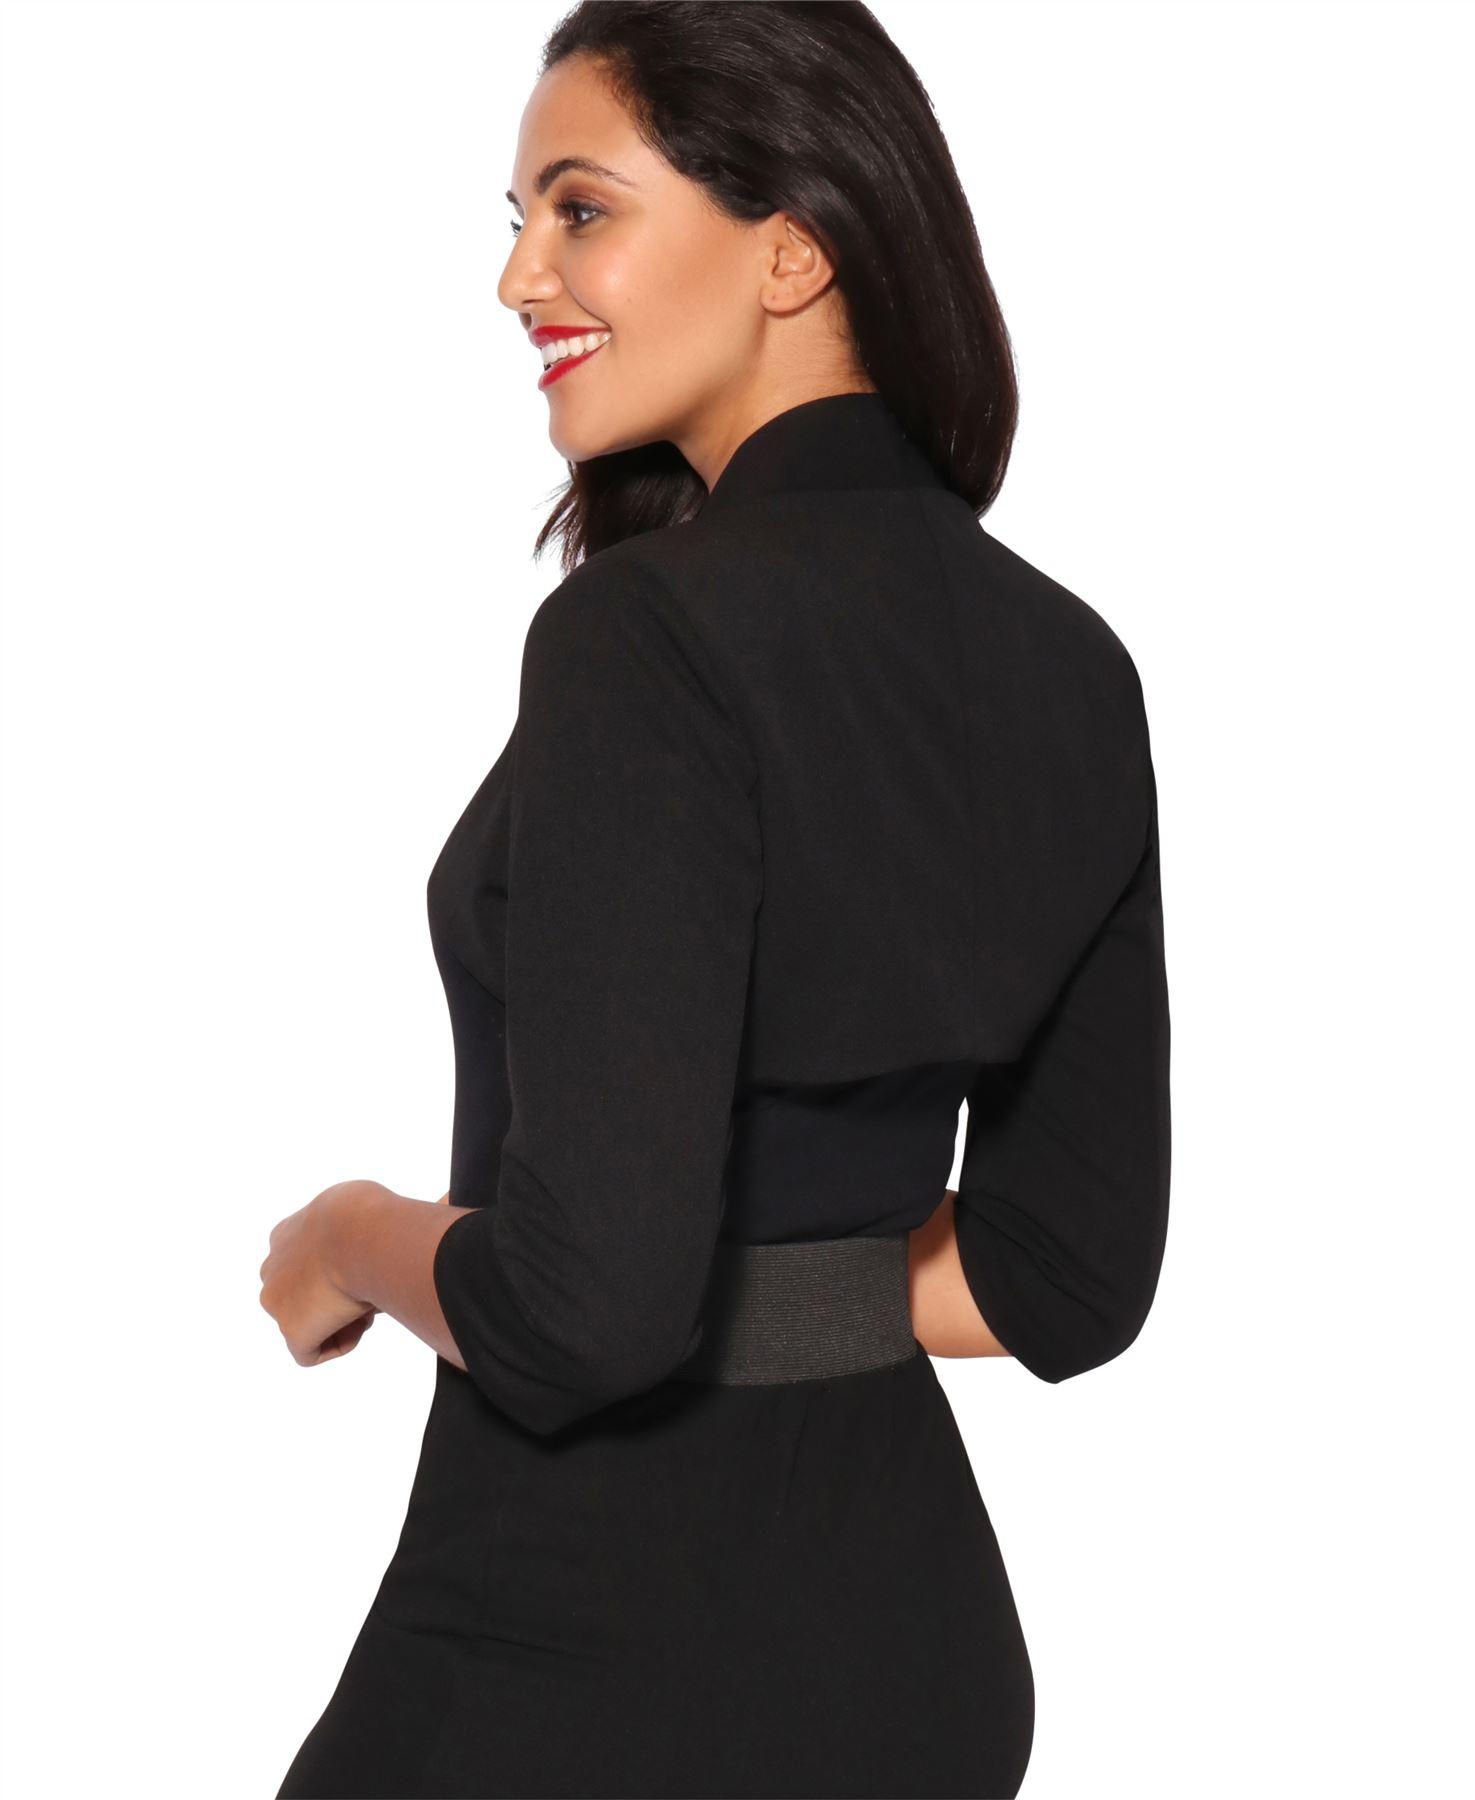 Womens-Tailored-Bolero-Shrug-Cropped-Top-Short-Sleeve-Party-Blazer-Jacket-Coat thumbnail 3